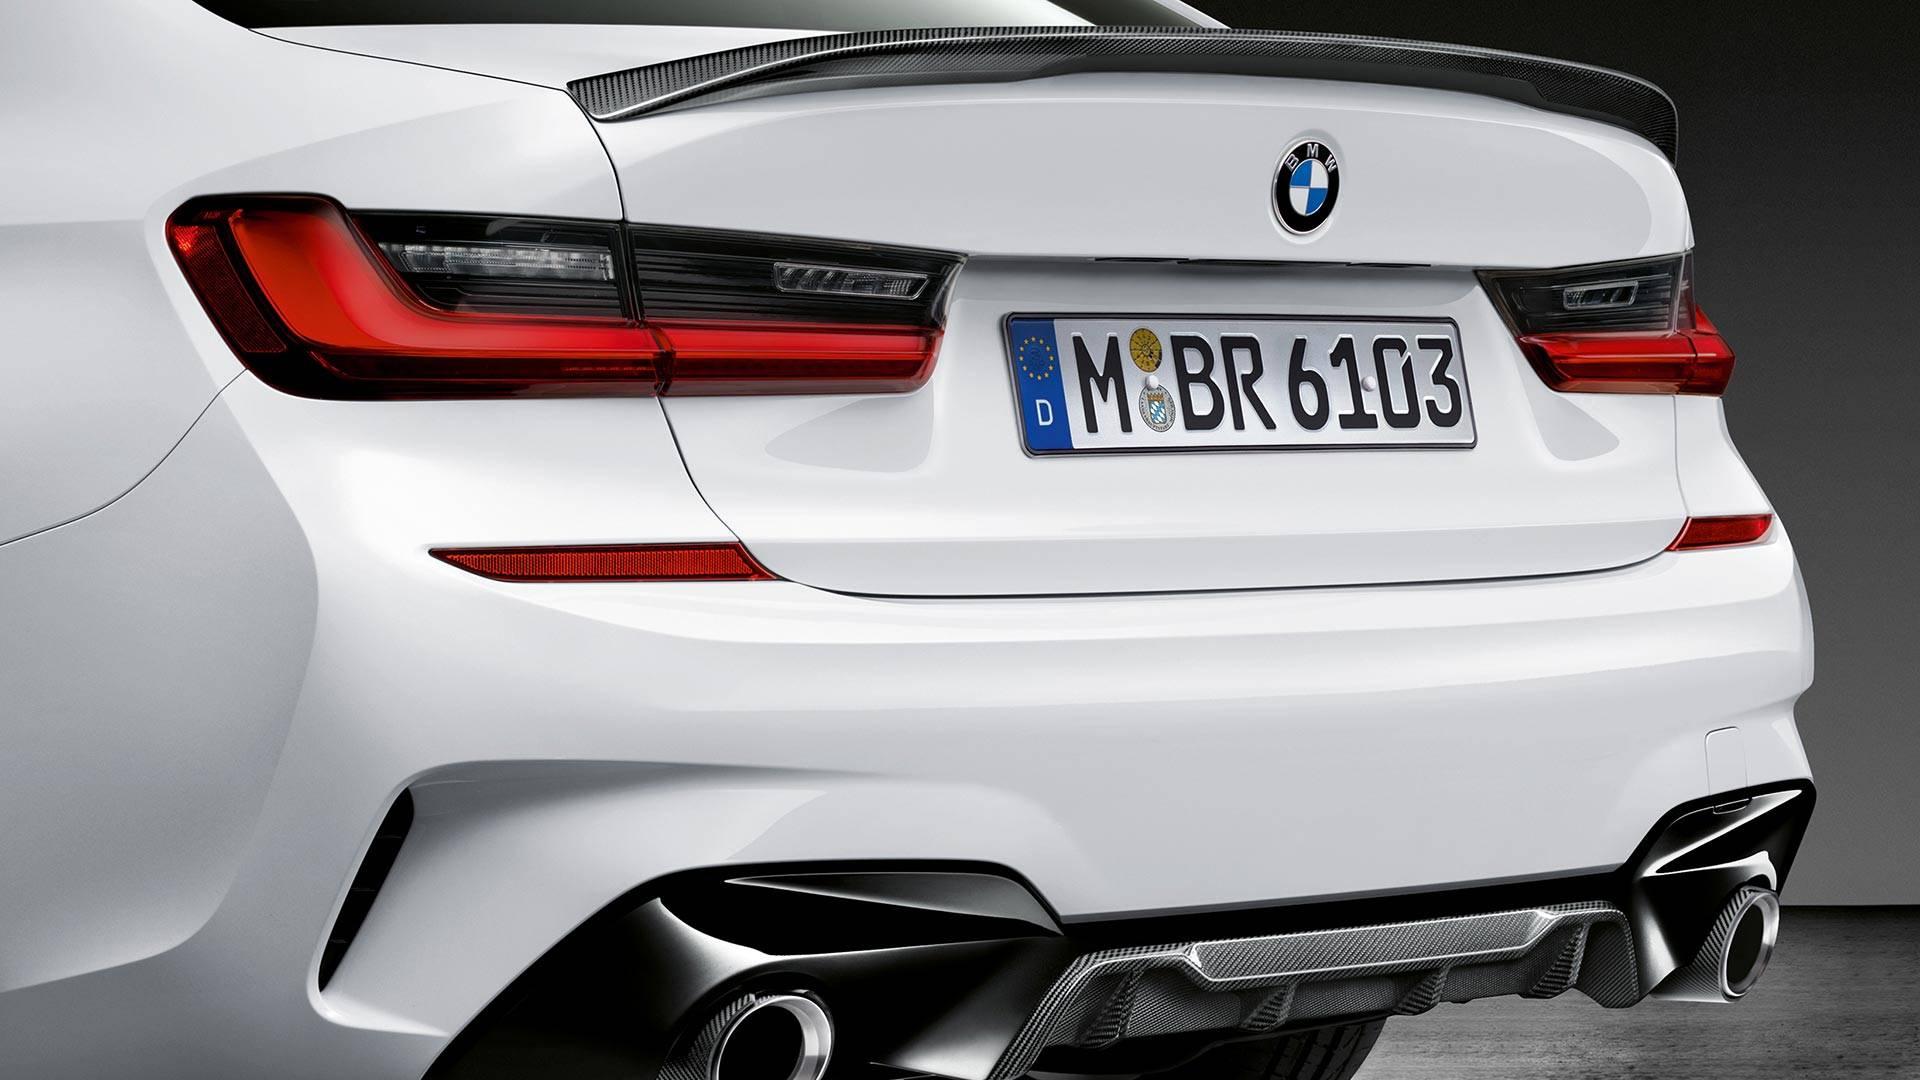 2019-bmw-3-series-m-performance-parts-6.jpg